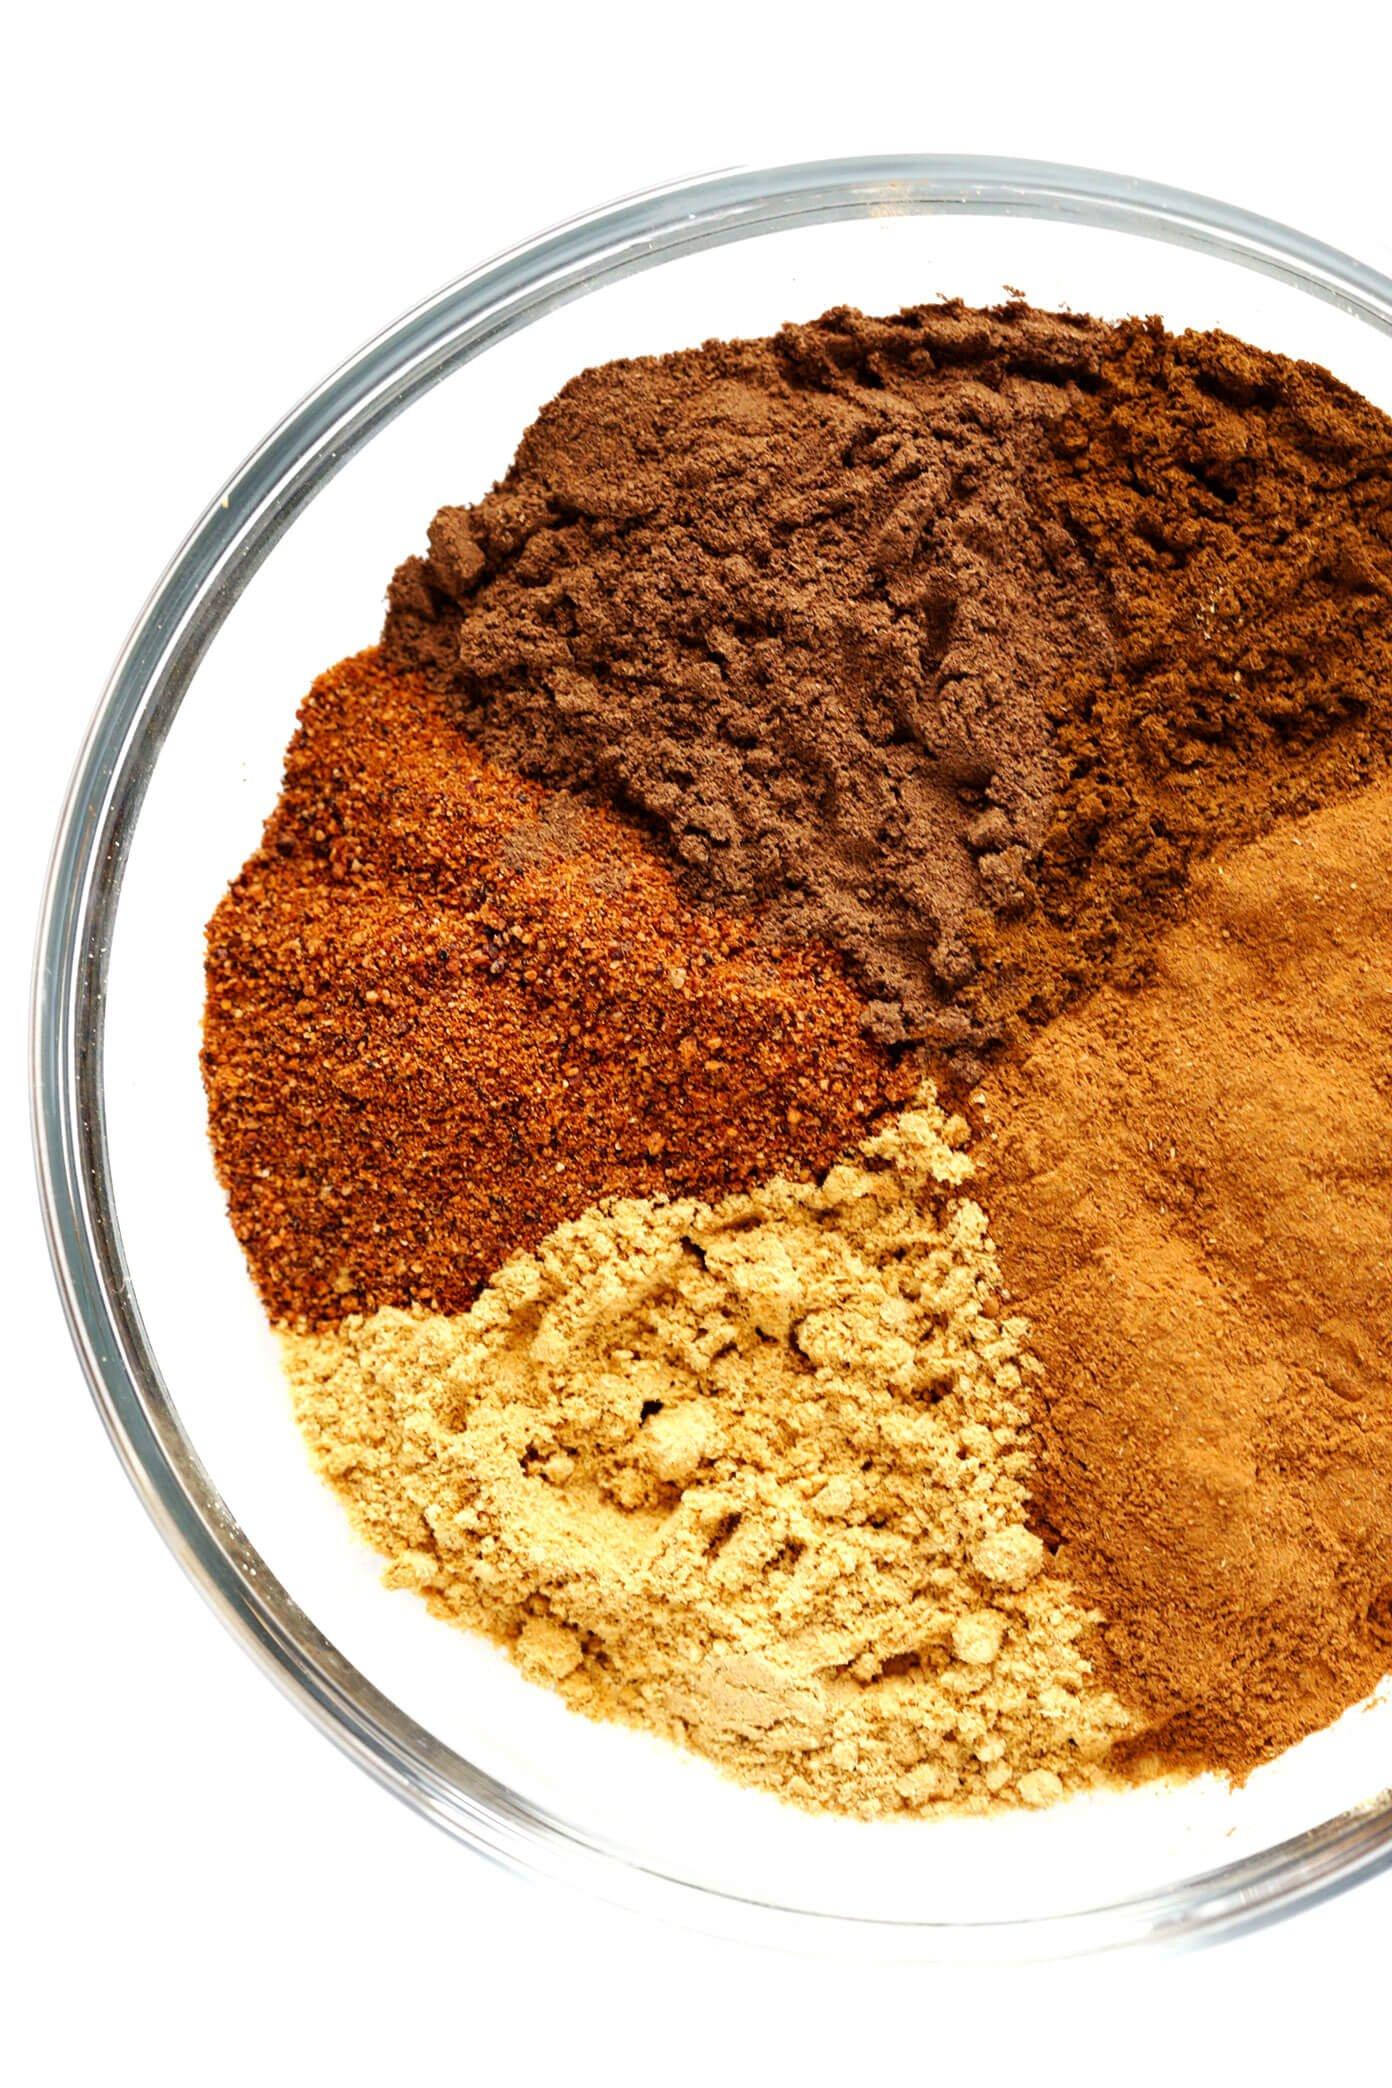 Pumpkin Pie Spice Recipe Ingredients -- Cinnamon, Ginger, Nutmeg, Allspice and Cloves